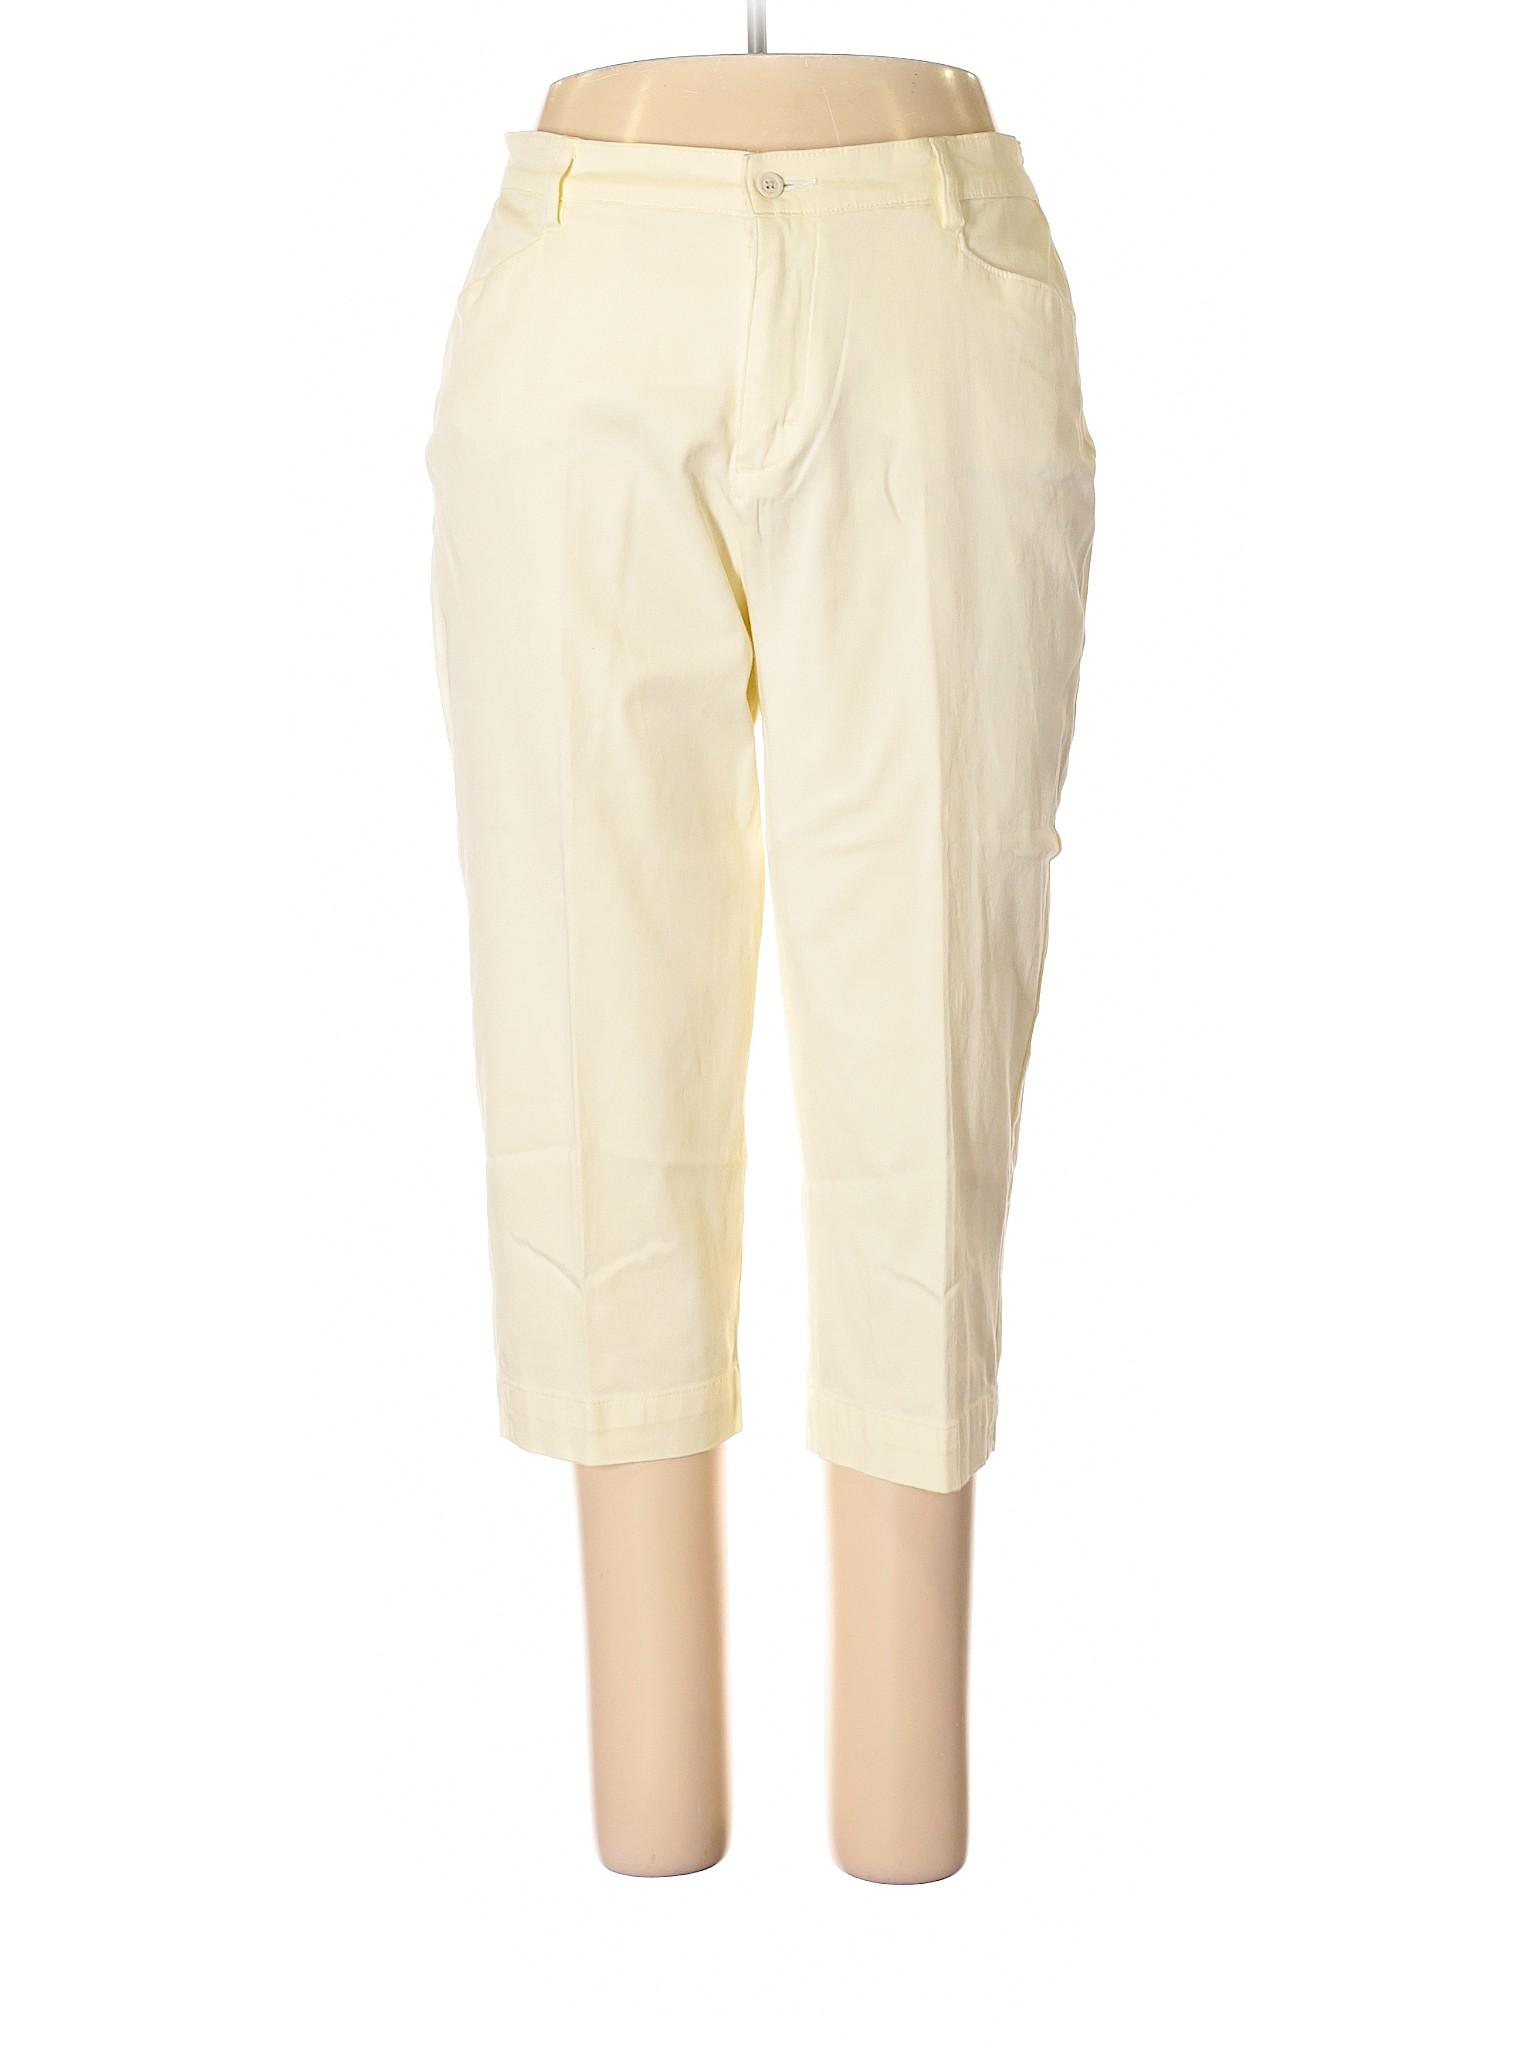 Casual Boutique leisure leisure Lee Pants Pants Boutique Lee Boutique Casual B7wSOxqg